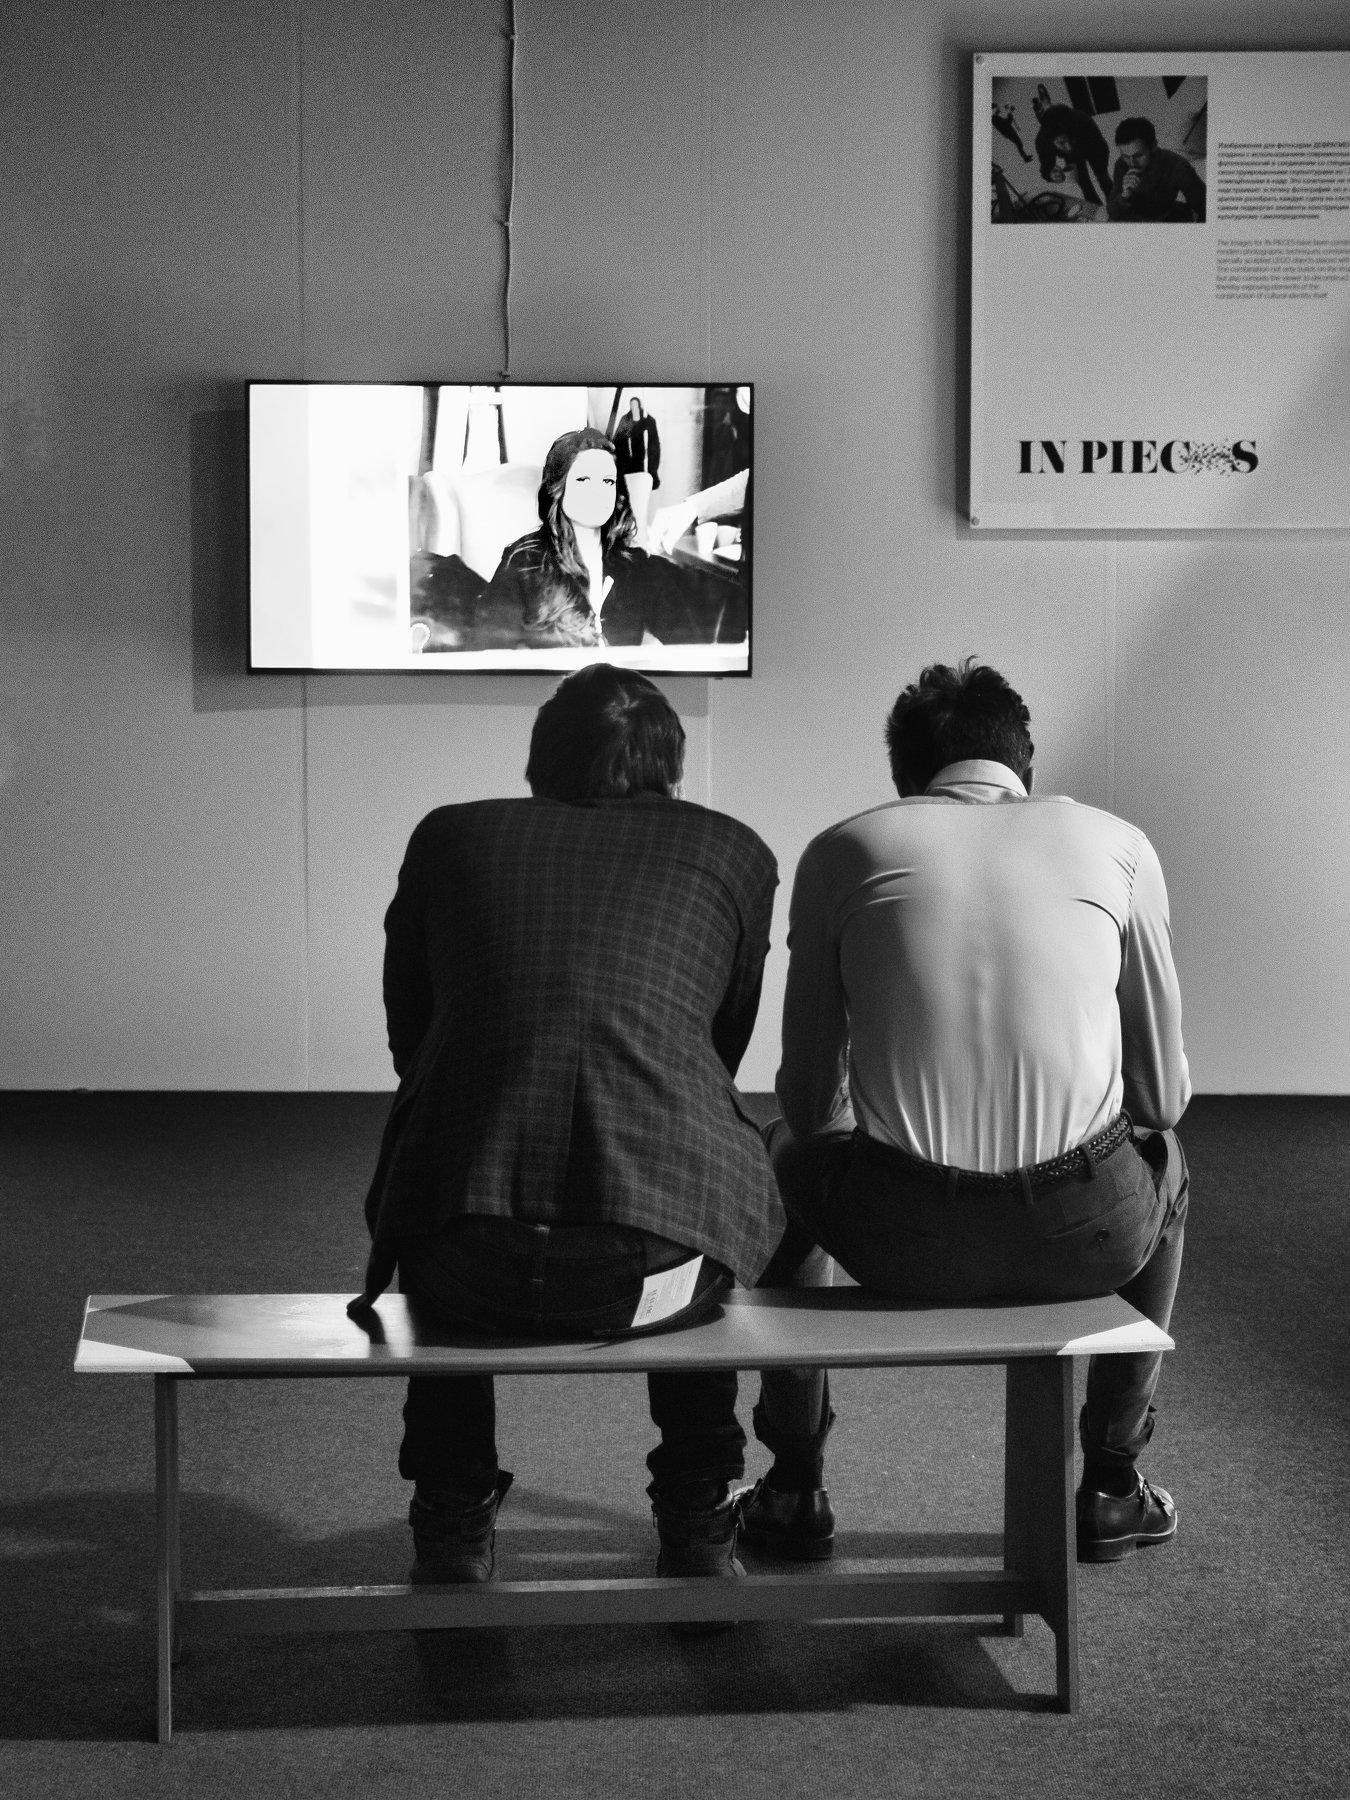 Exibition, Moscow, Russia, Black and white, Monochrome, Street, Portrait, Elena Beregatnova